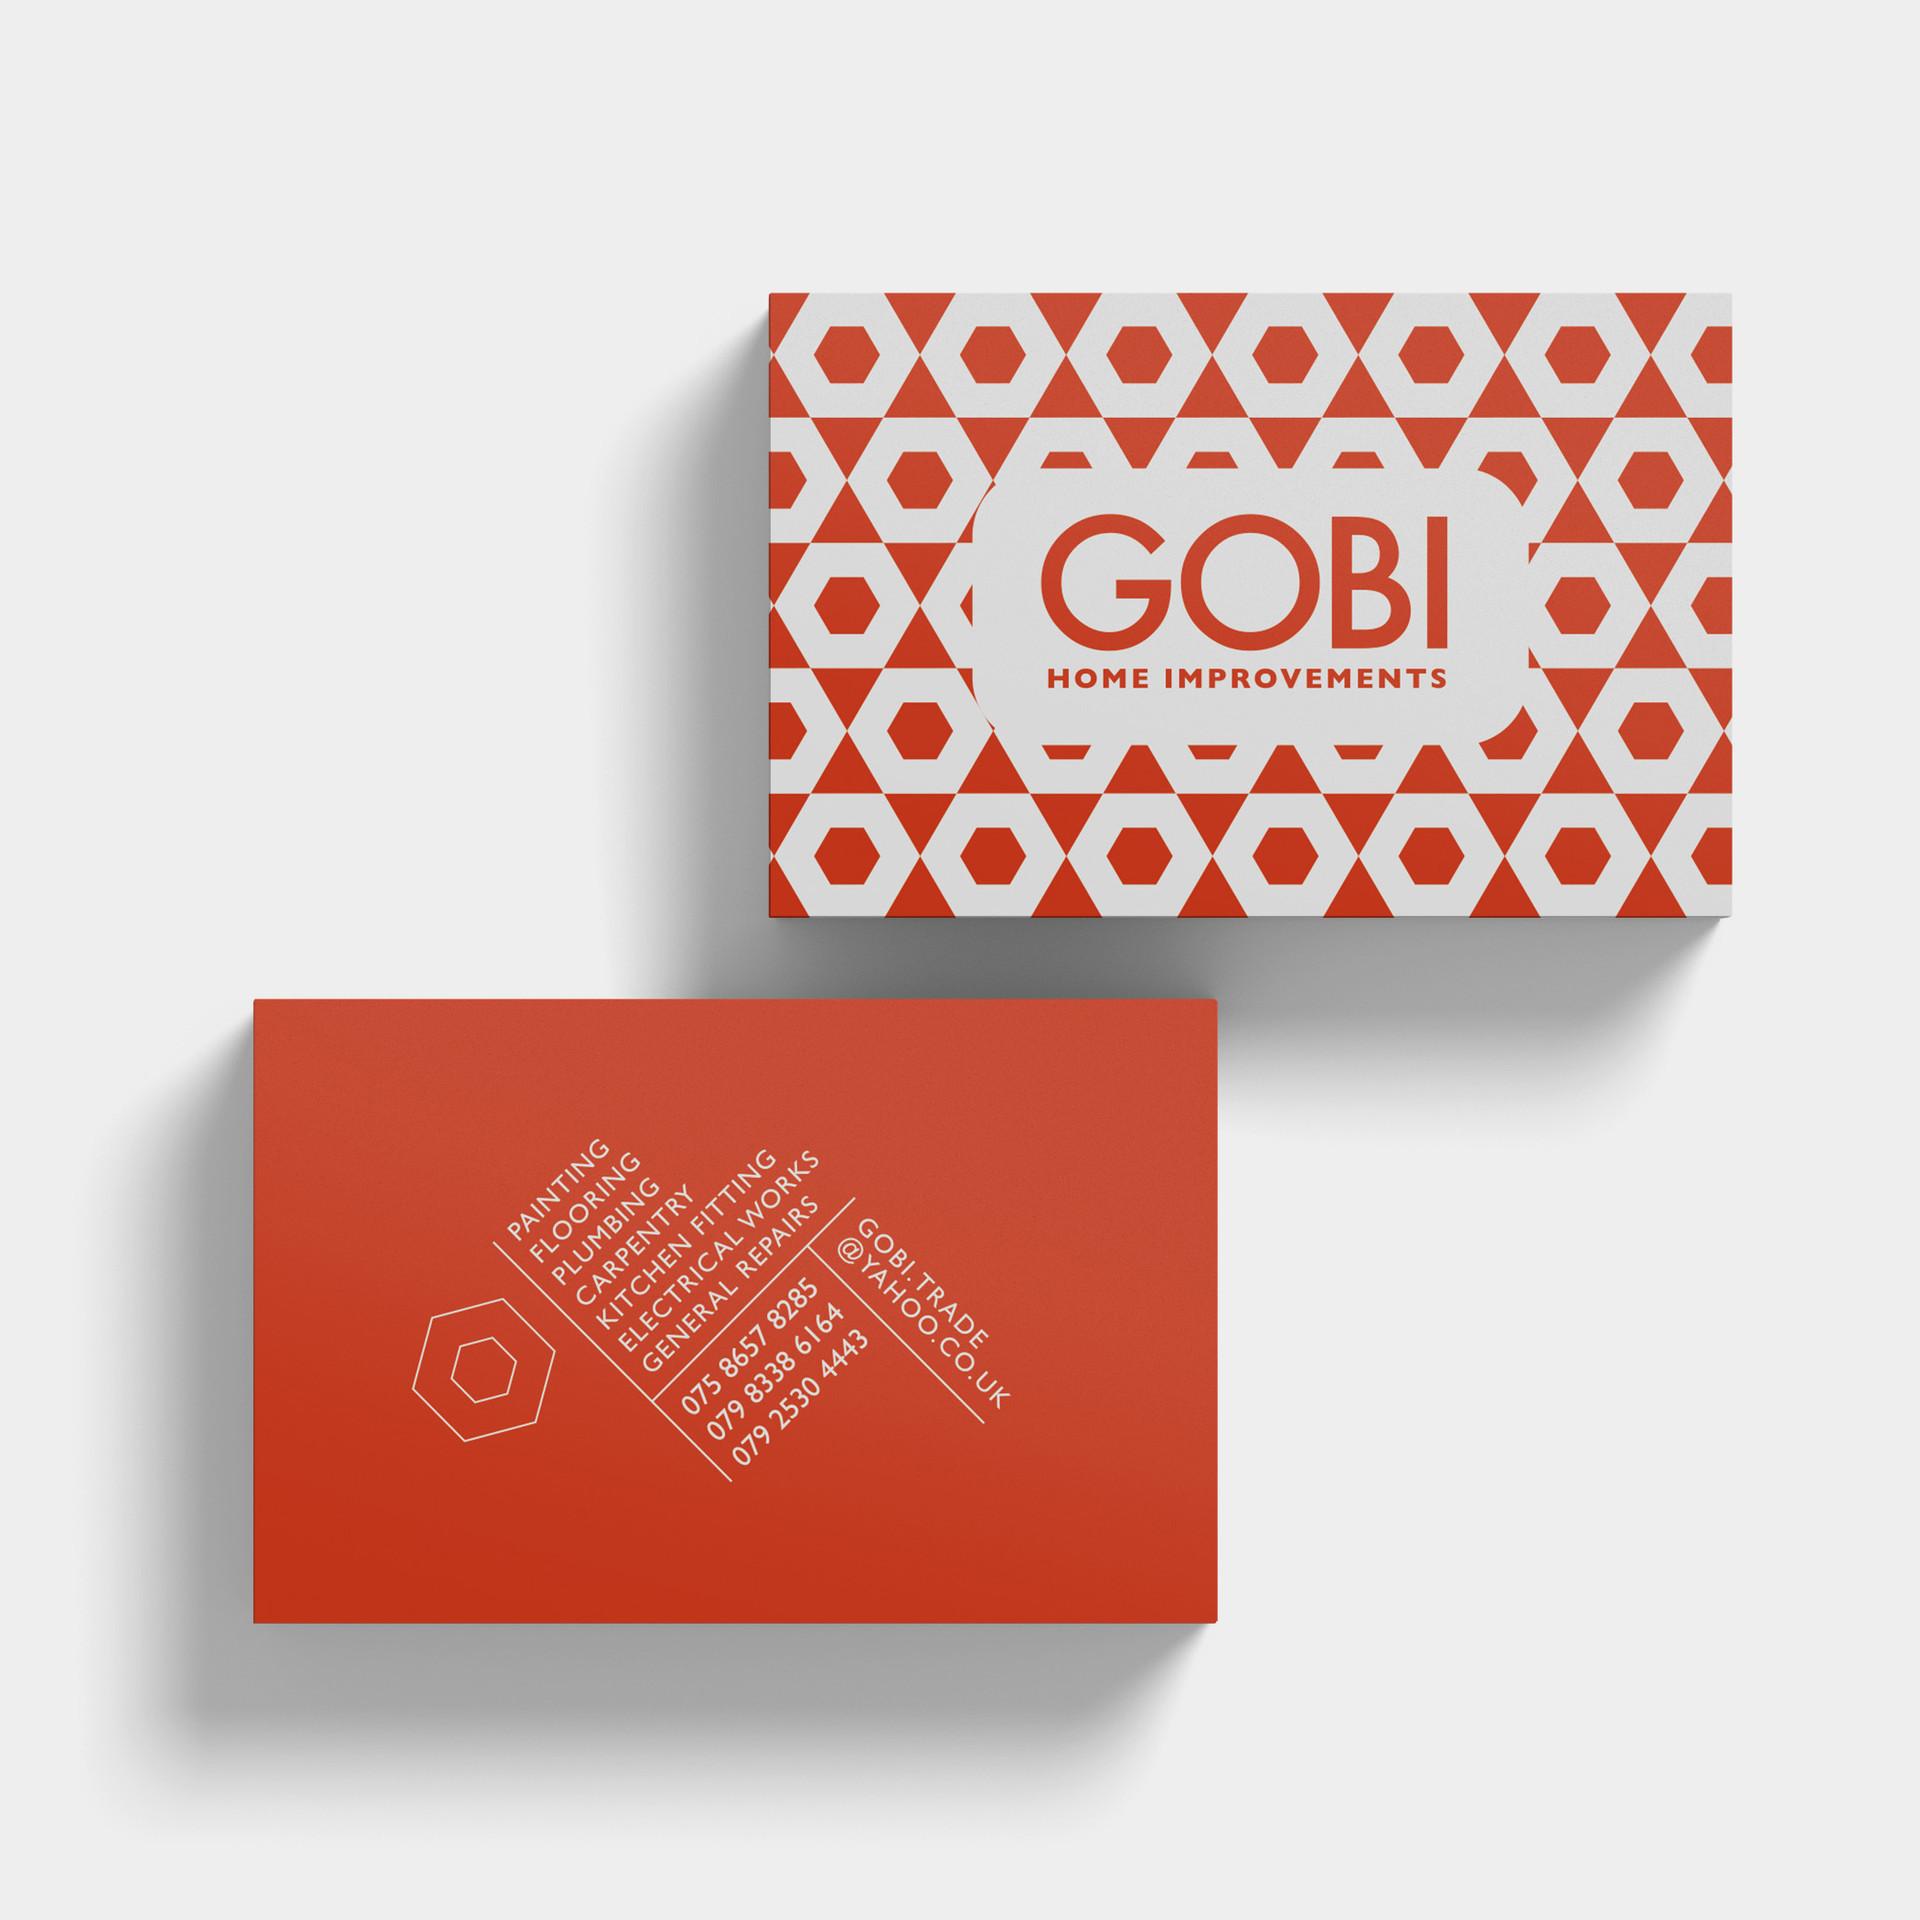 gobi1.JPG